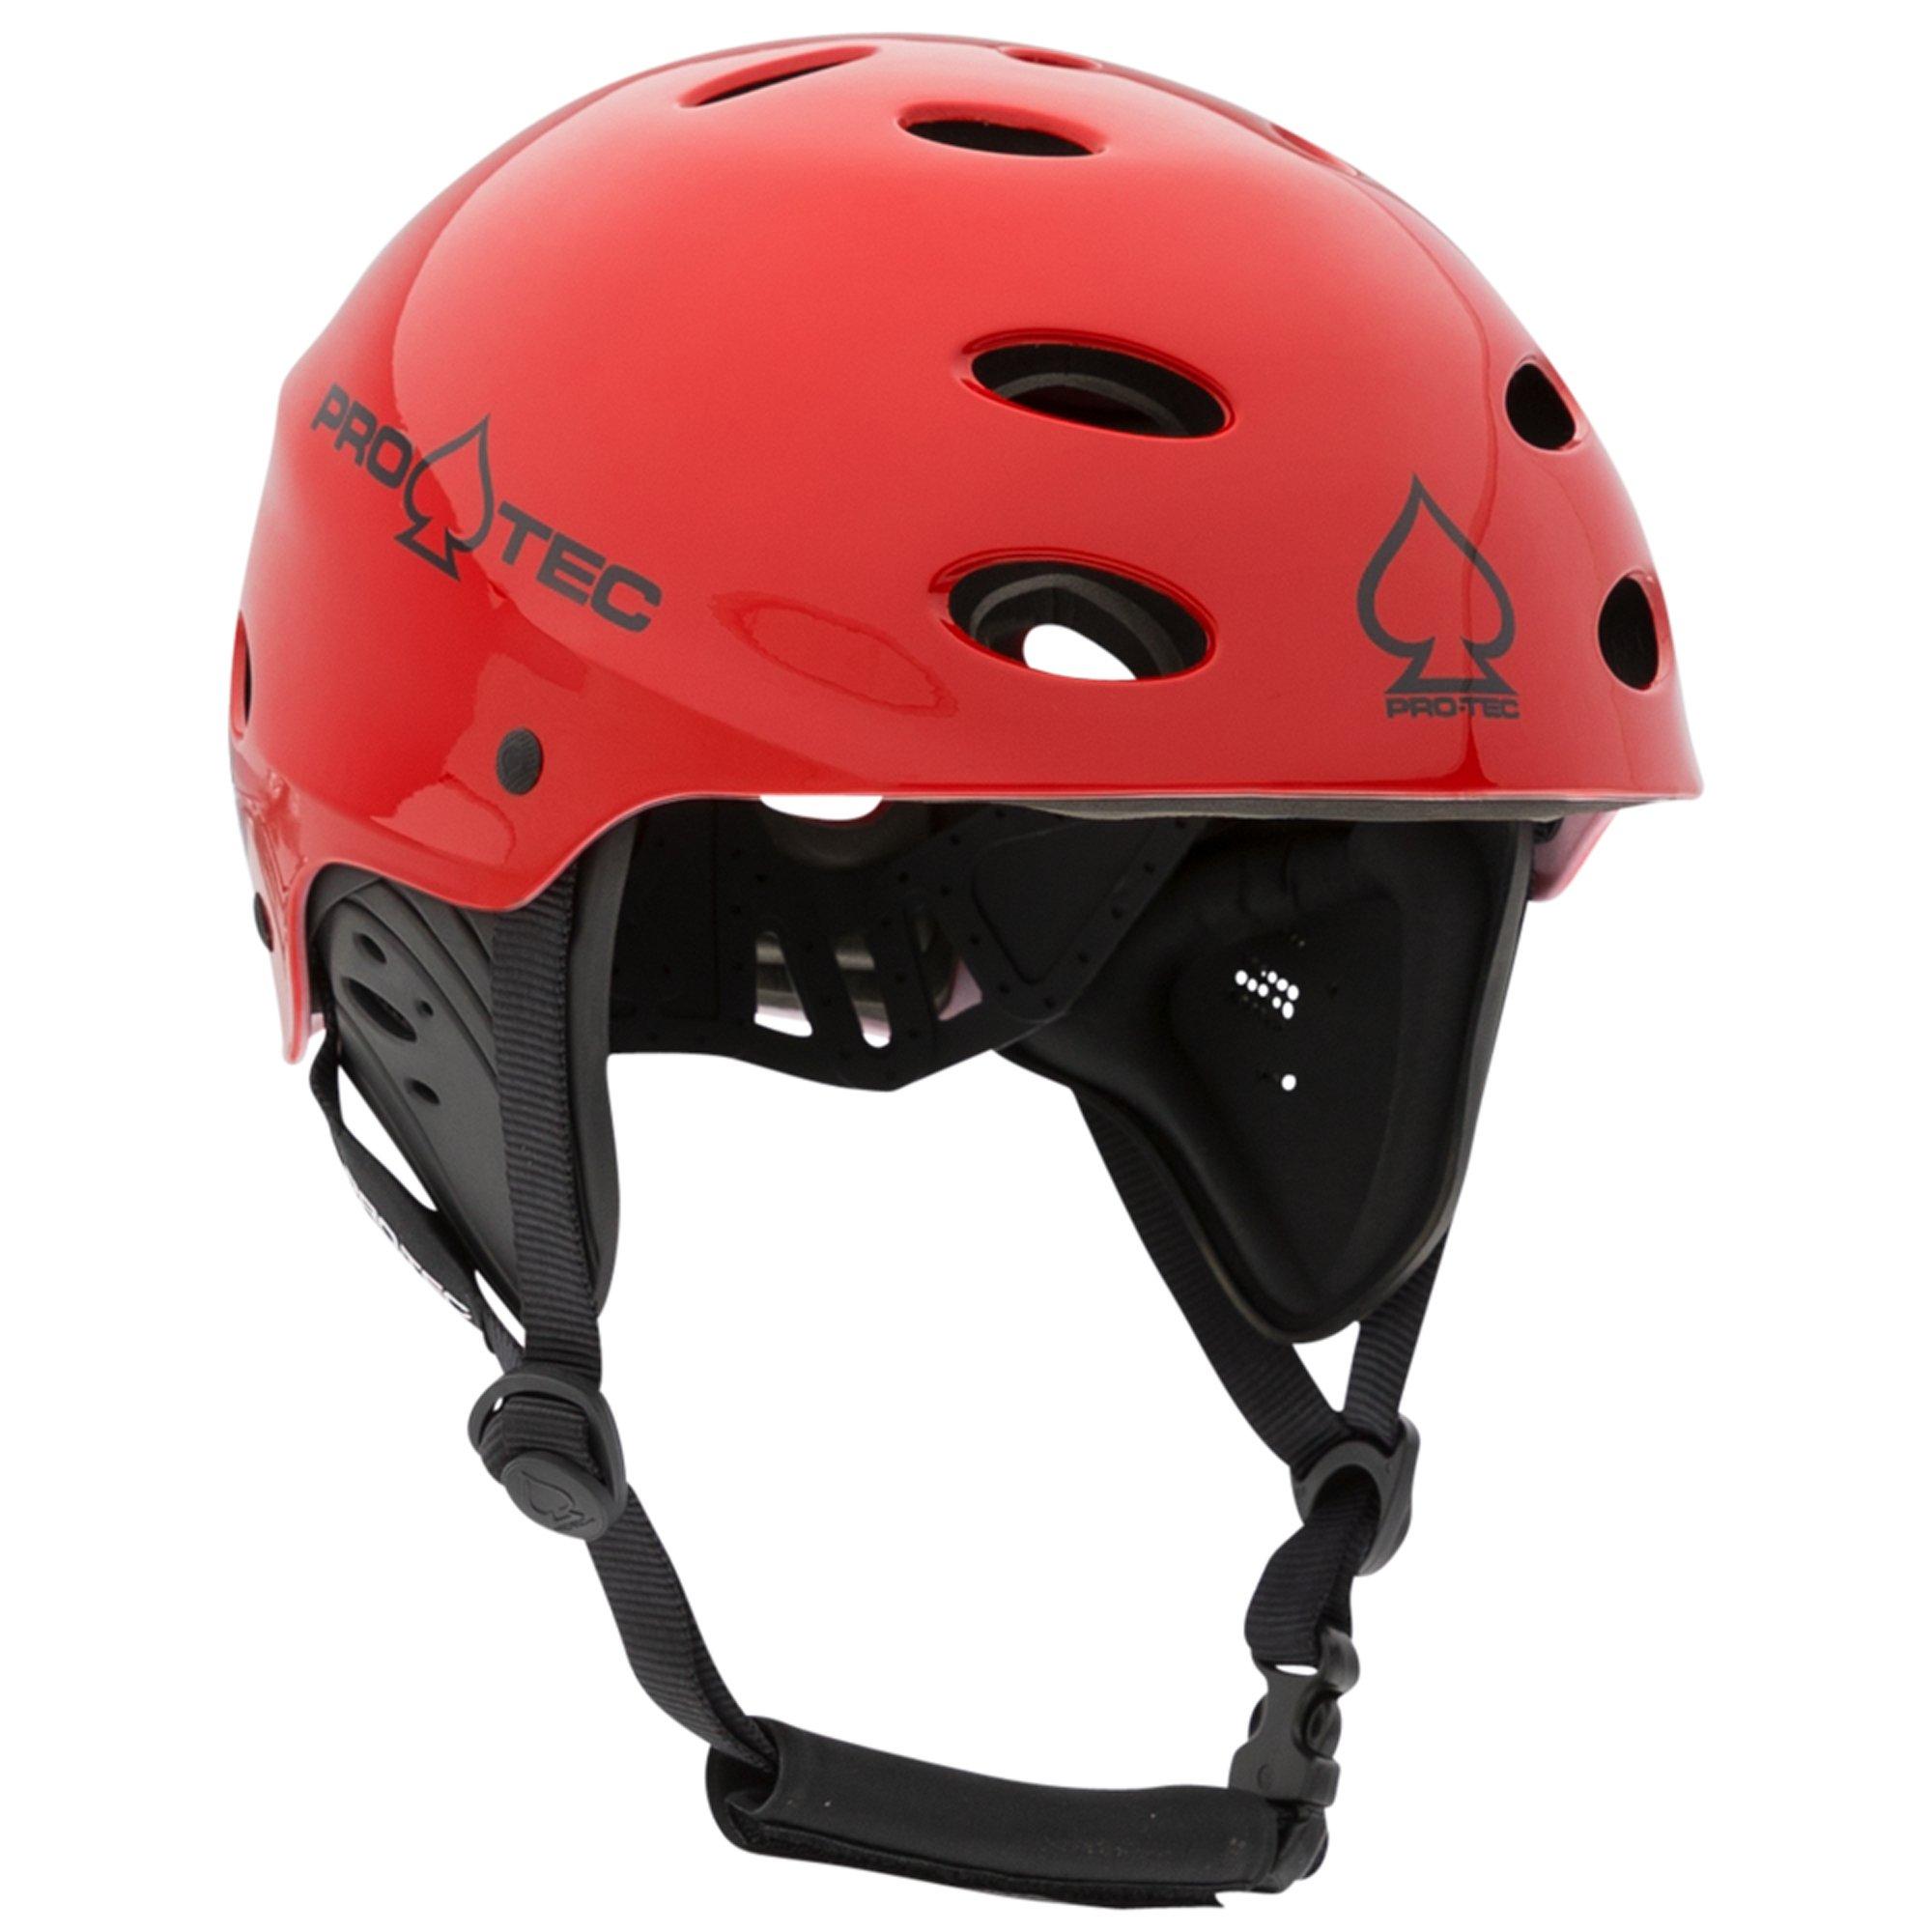 Pro-Tec - Ace Wake Helmet, Gloss Red, M